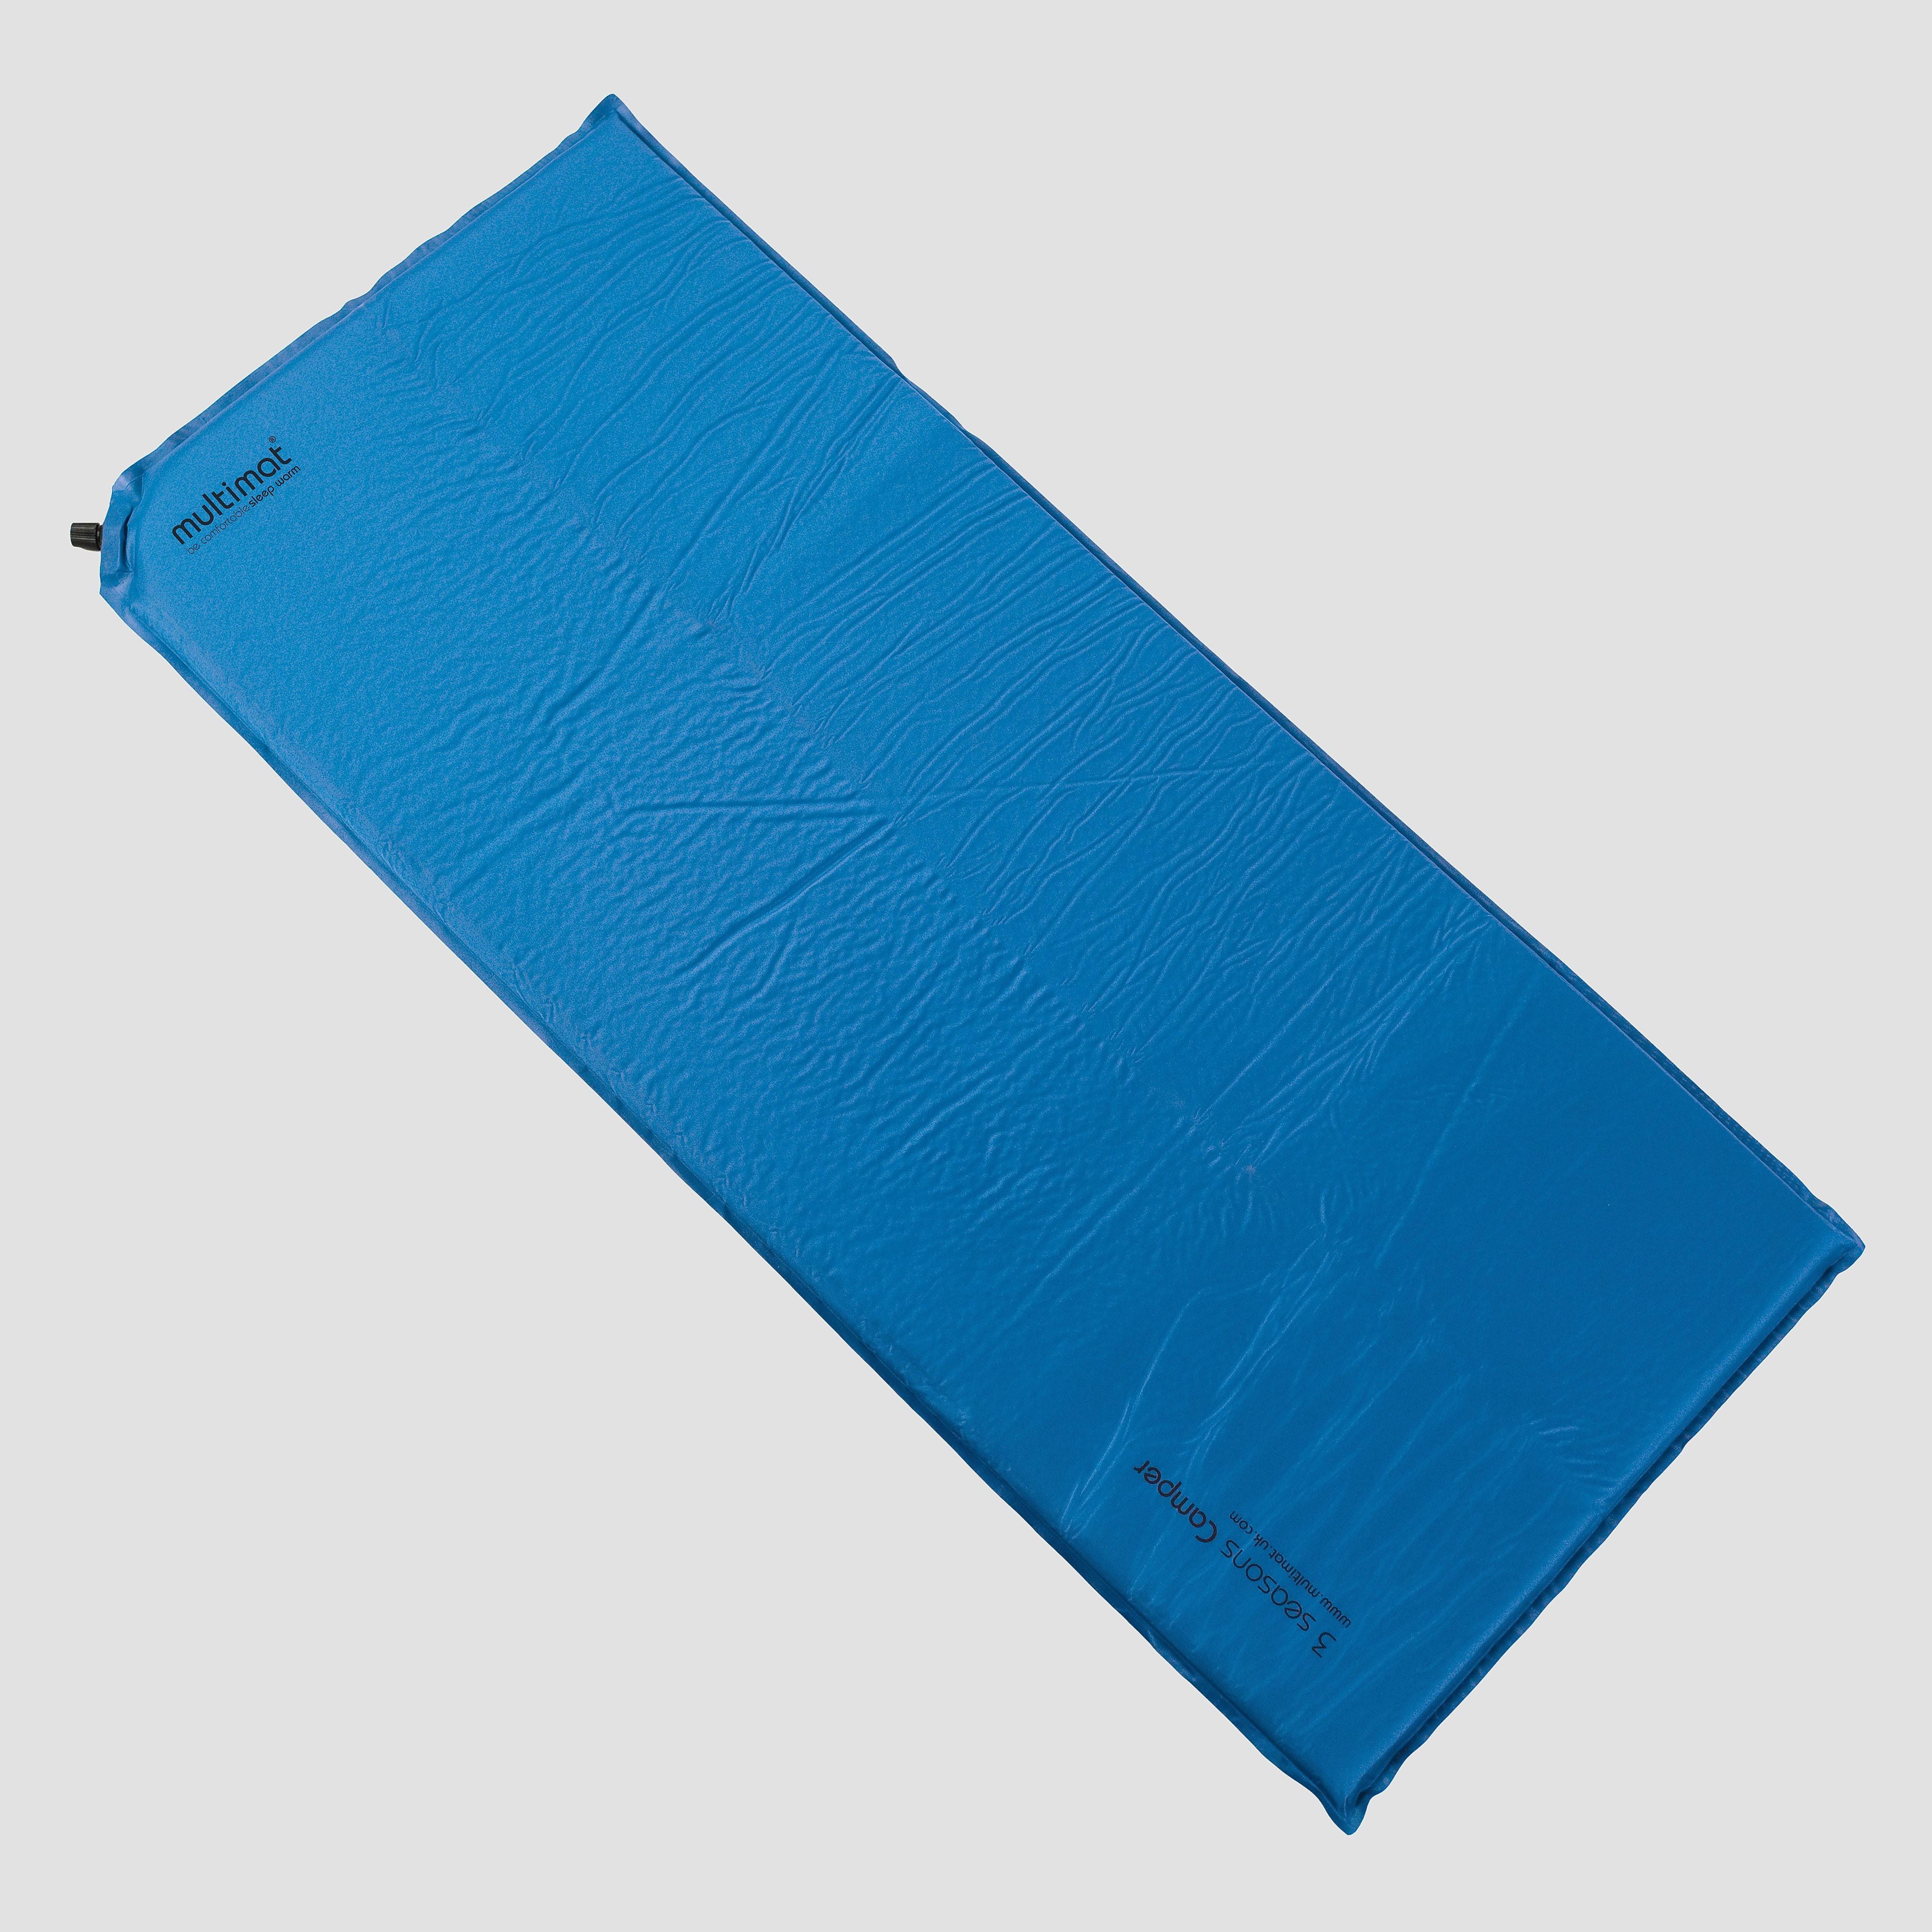 Multimat Camper Compact 25 3/4 Self-Inflating Camping Mat